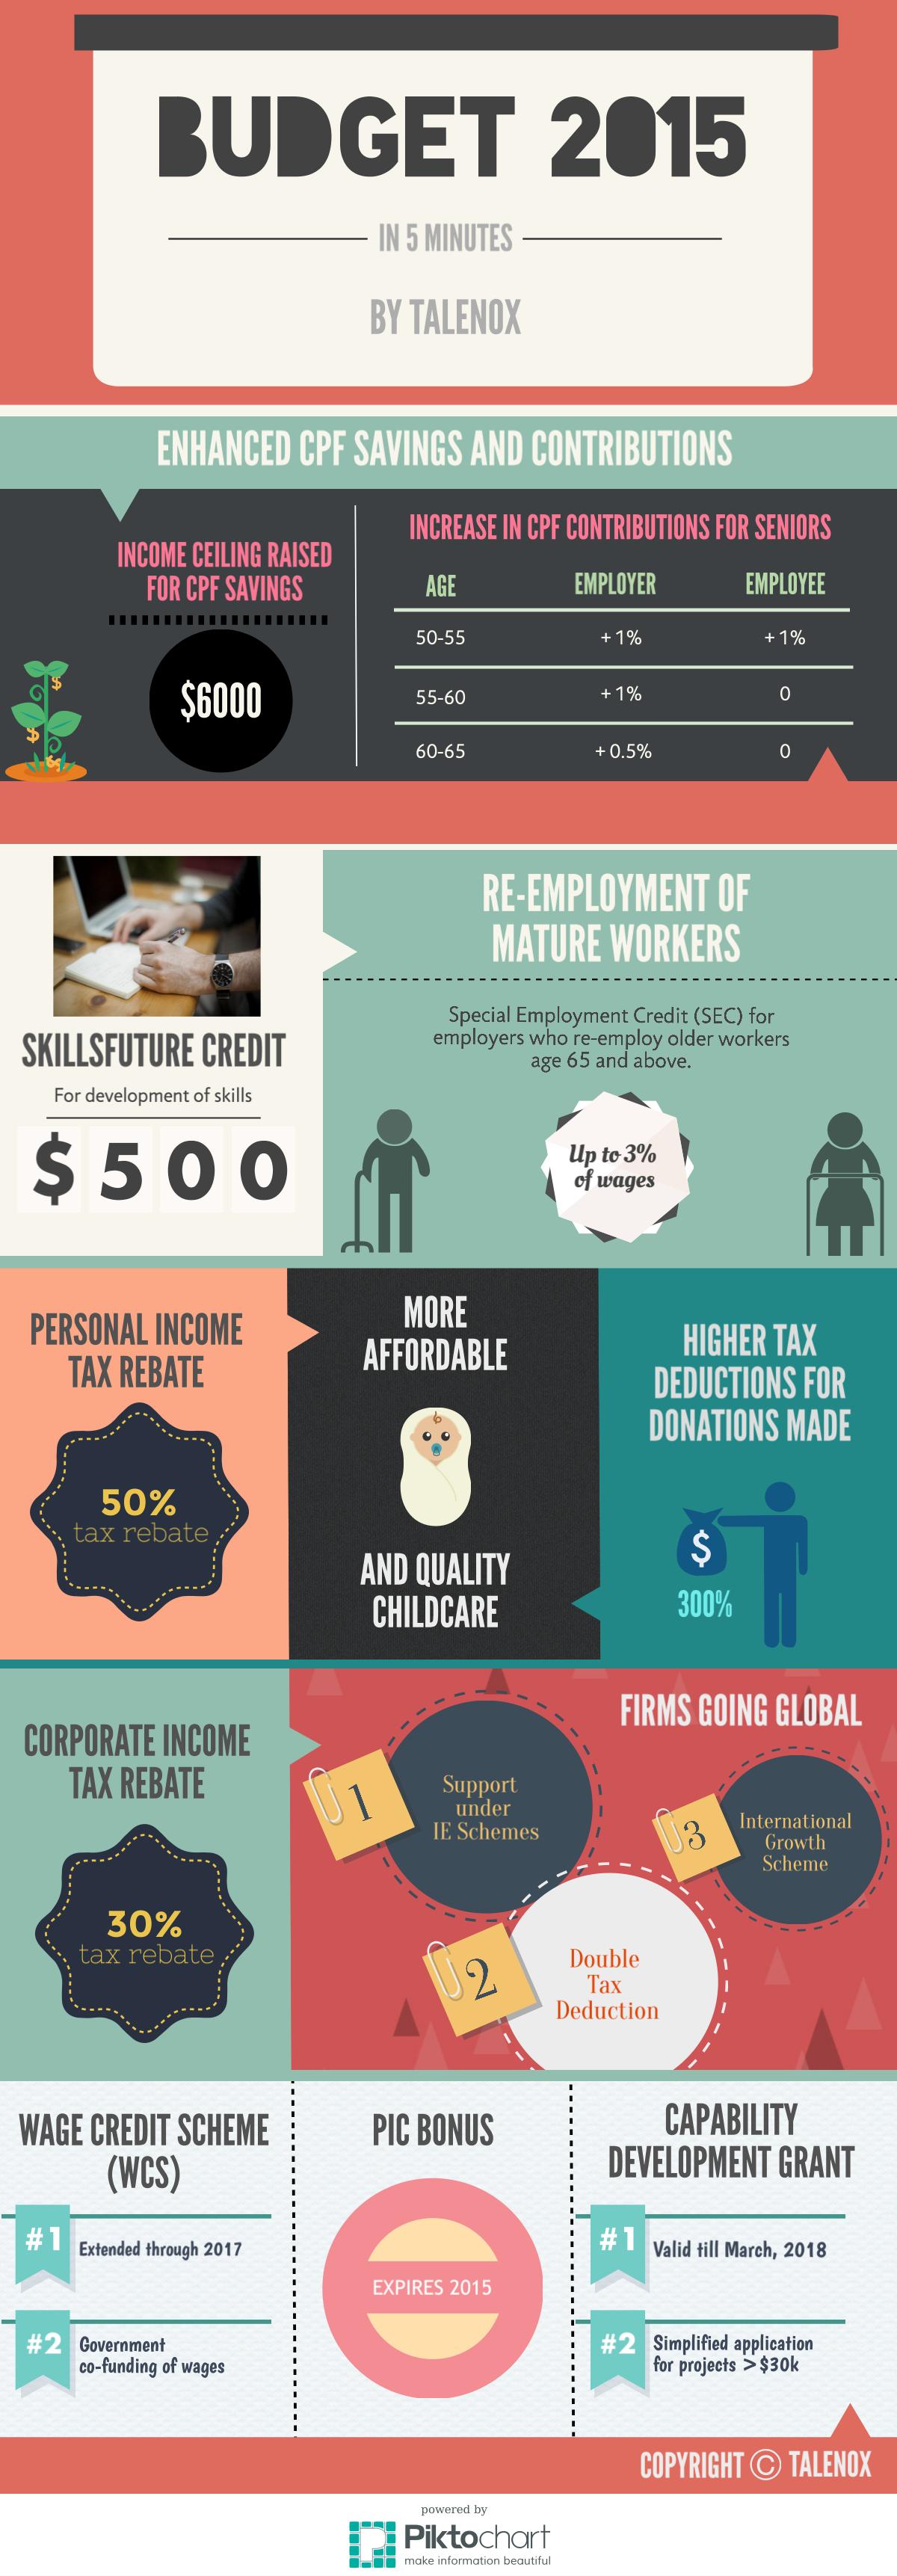 Singapore budget 2015 talenox infographic